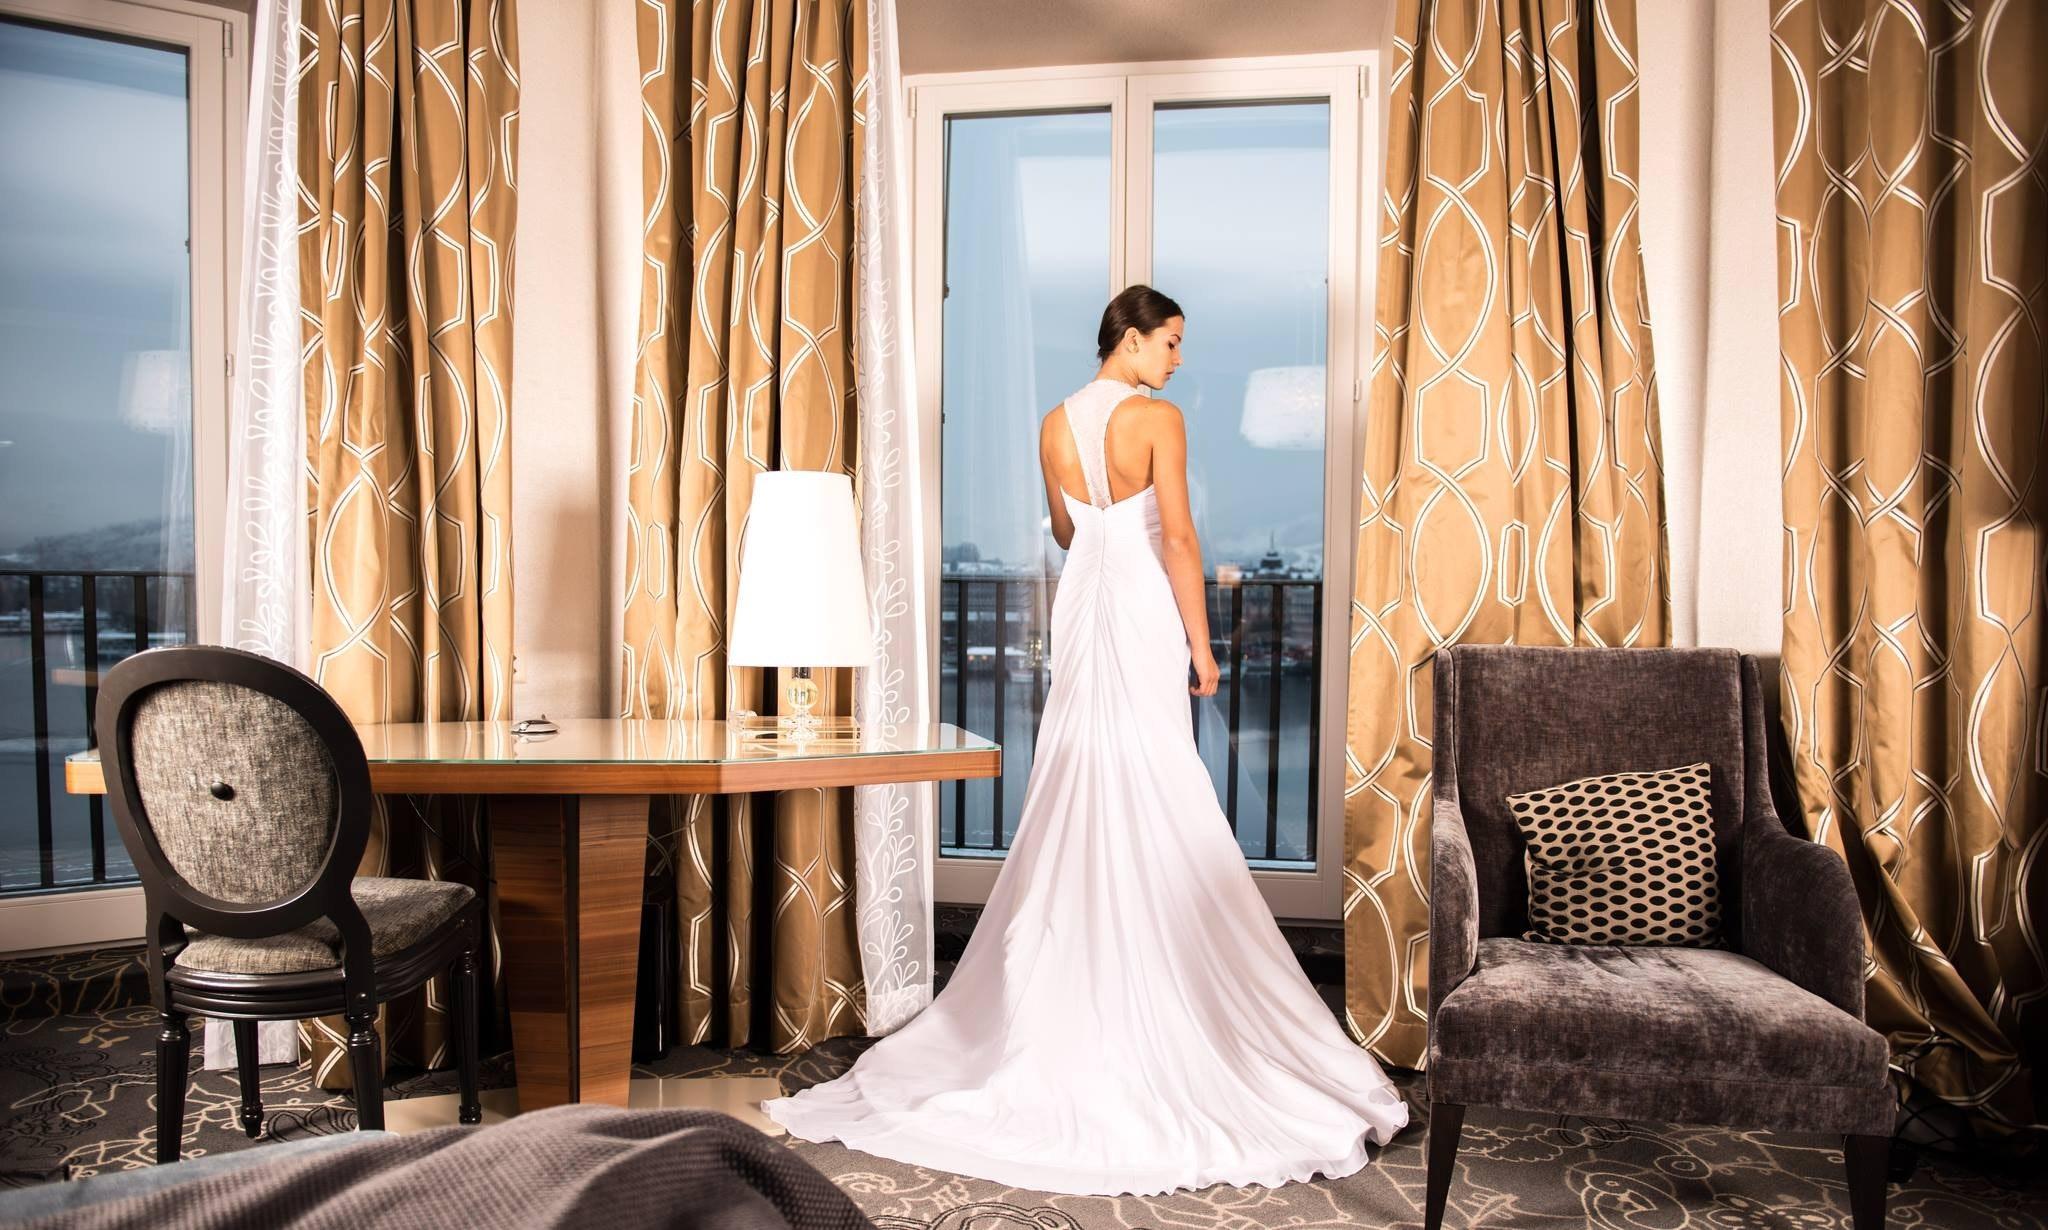 Dropship Wedding Dresses 55 Cool Image source